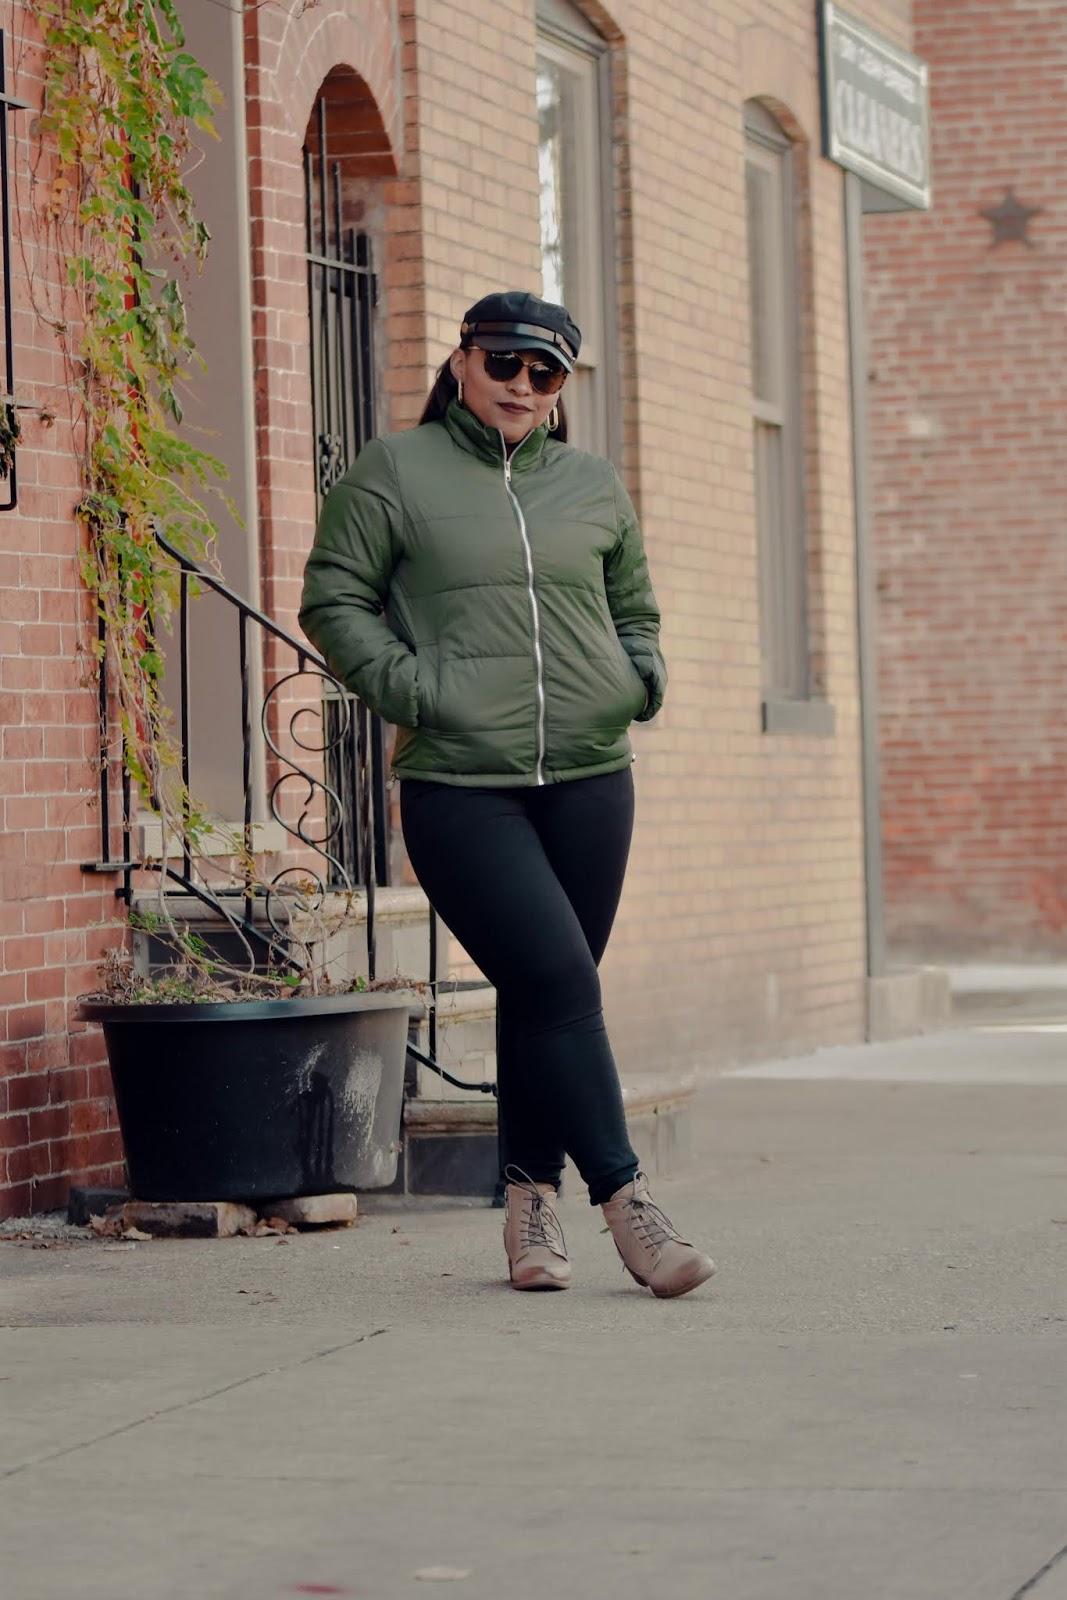 lookbook store, puffer jackers, winter jackets, warm coats for winter.